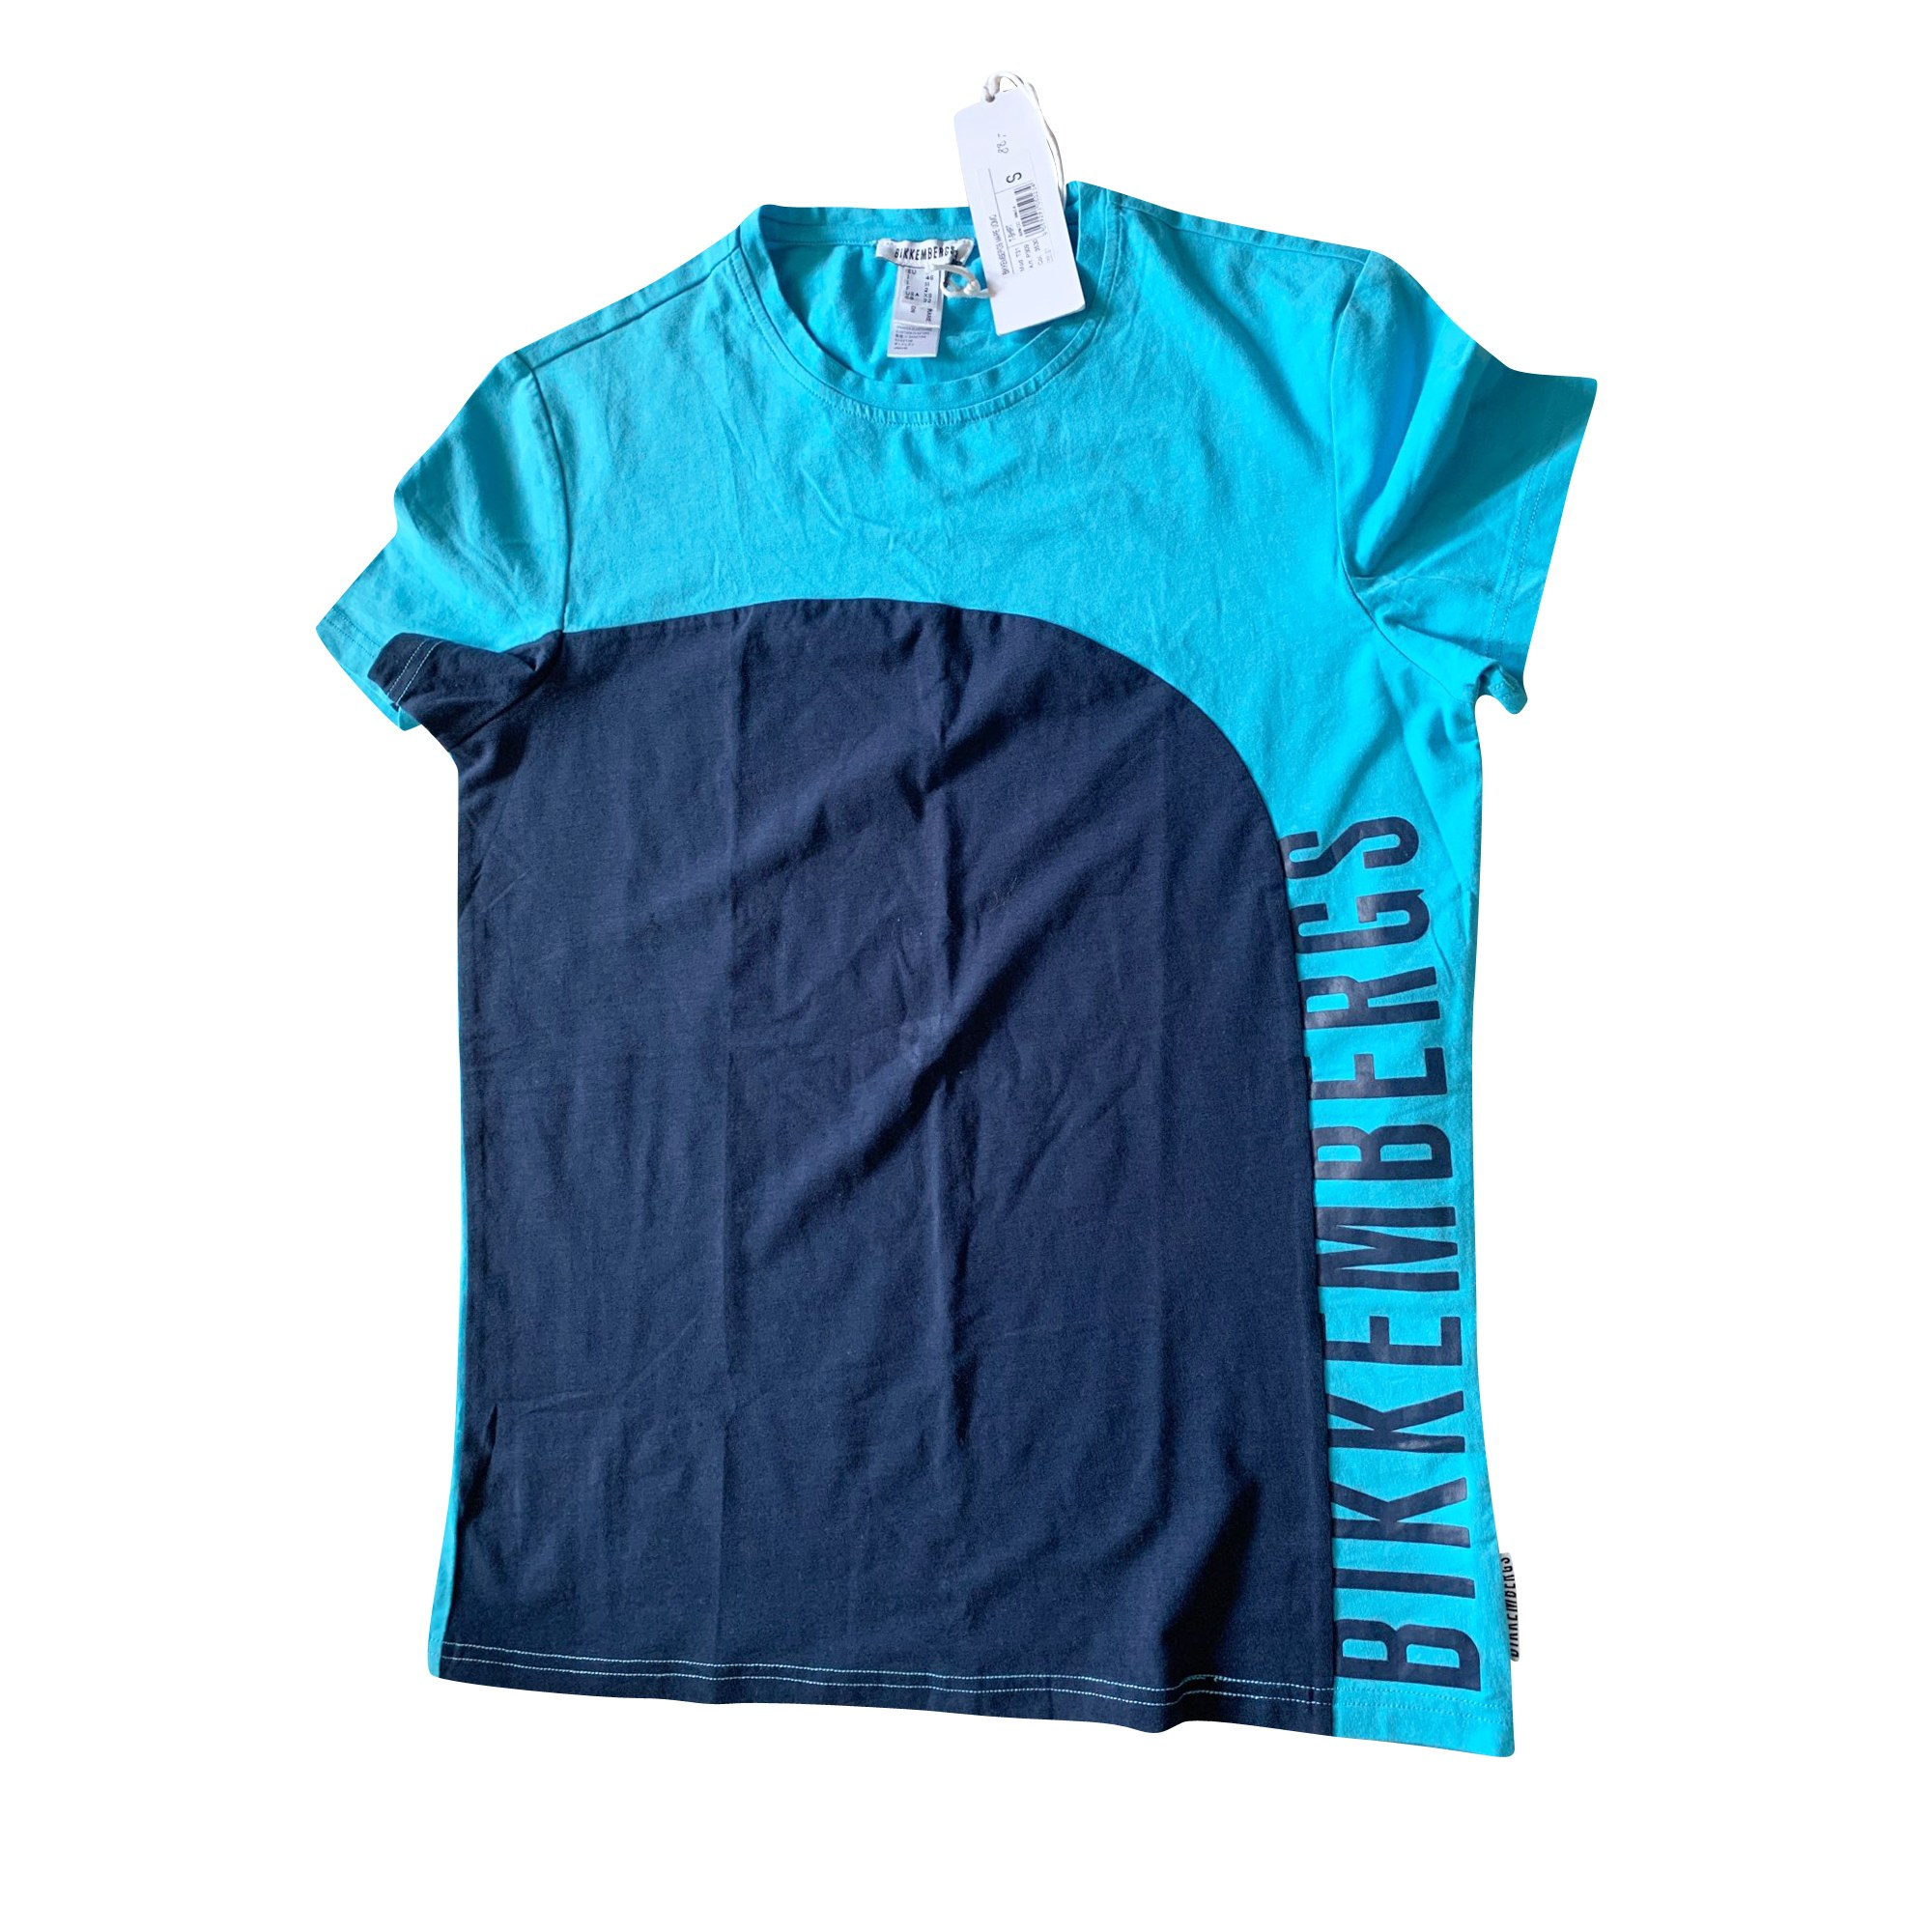 Tee-shirt DIRK BIKKEMBERGS Bleu, bleu marine, bleu turquoise